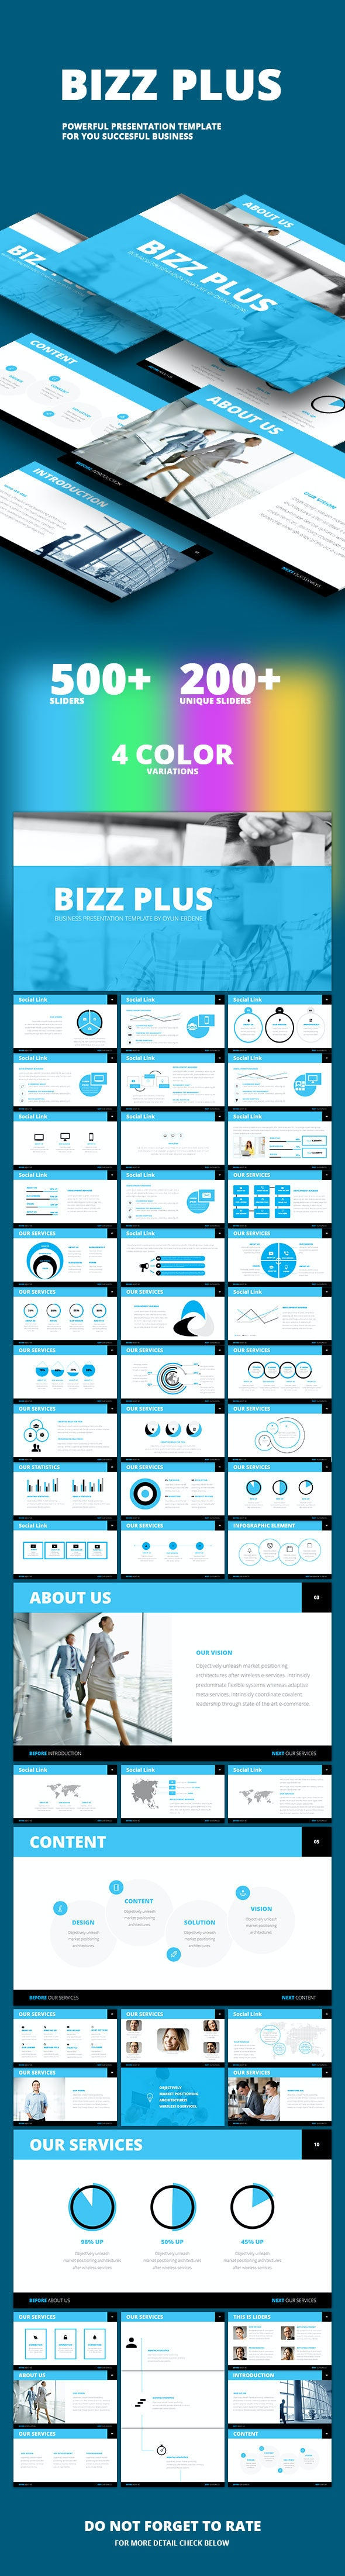 Bizz Plus - Business Presentation Template - PowerPoint Templates Presentation Templates